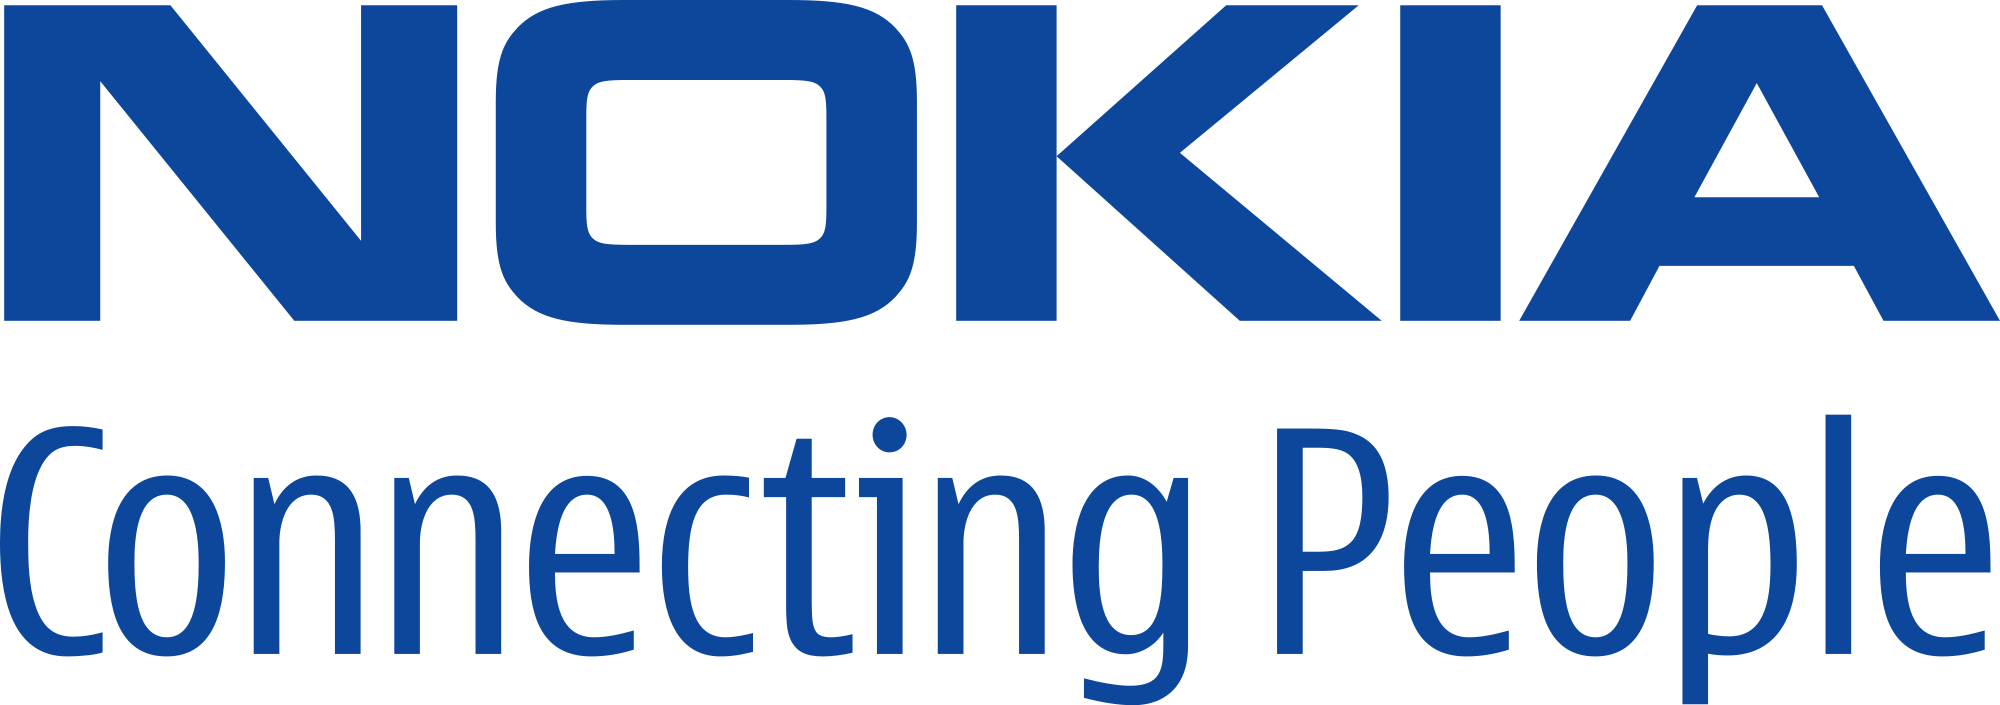 Nokia Logo Png.